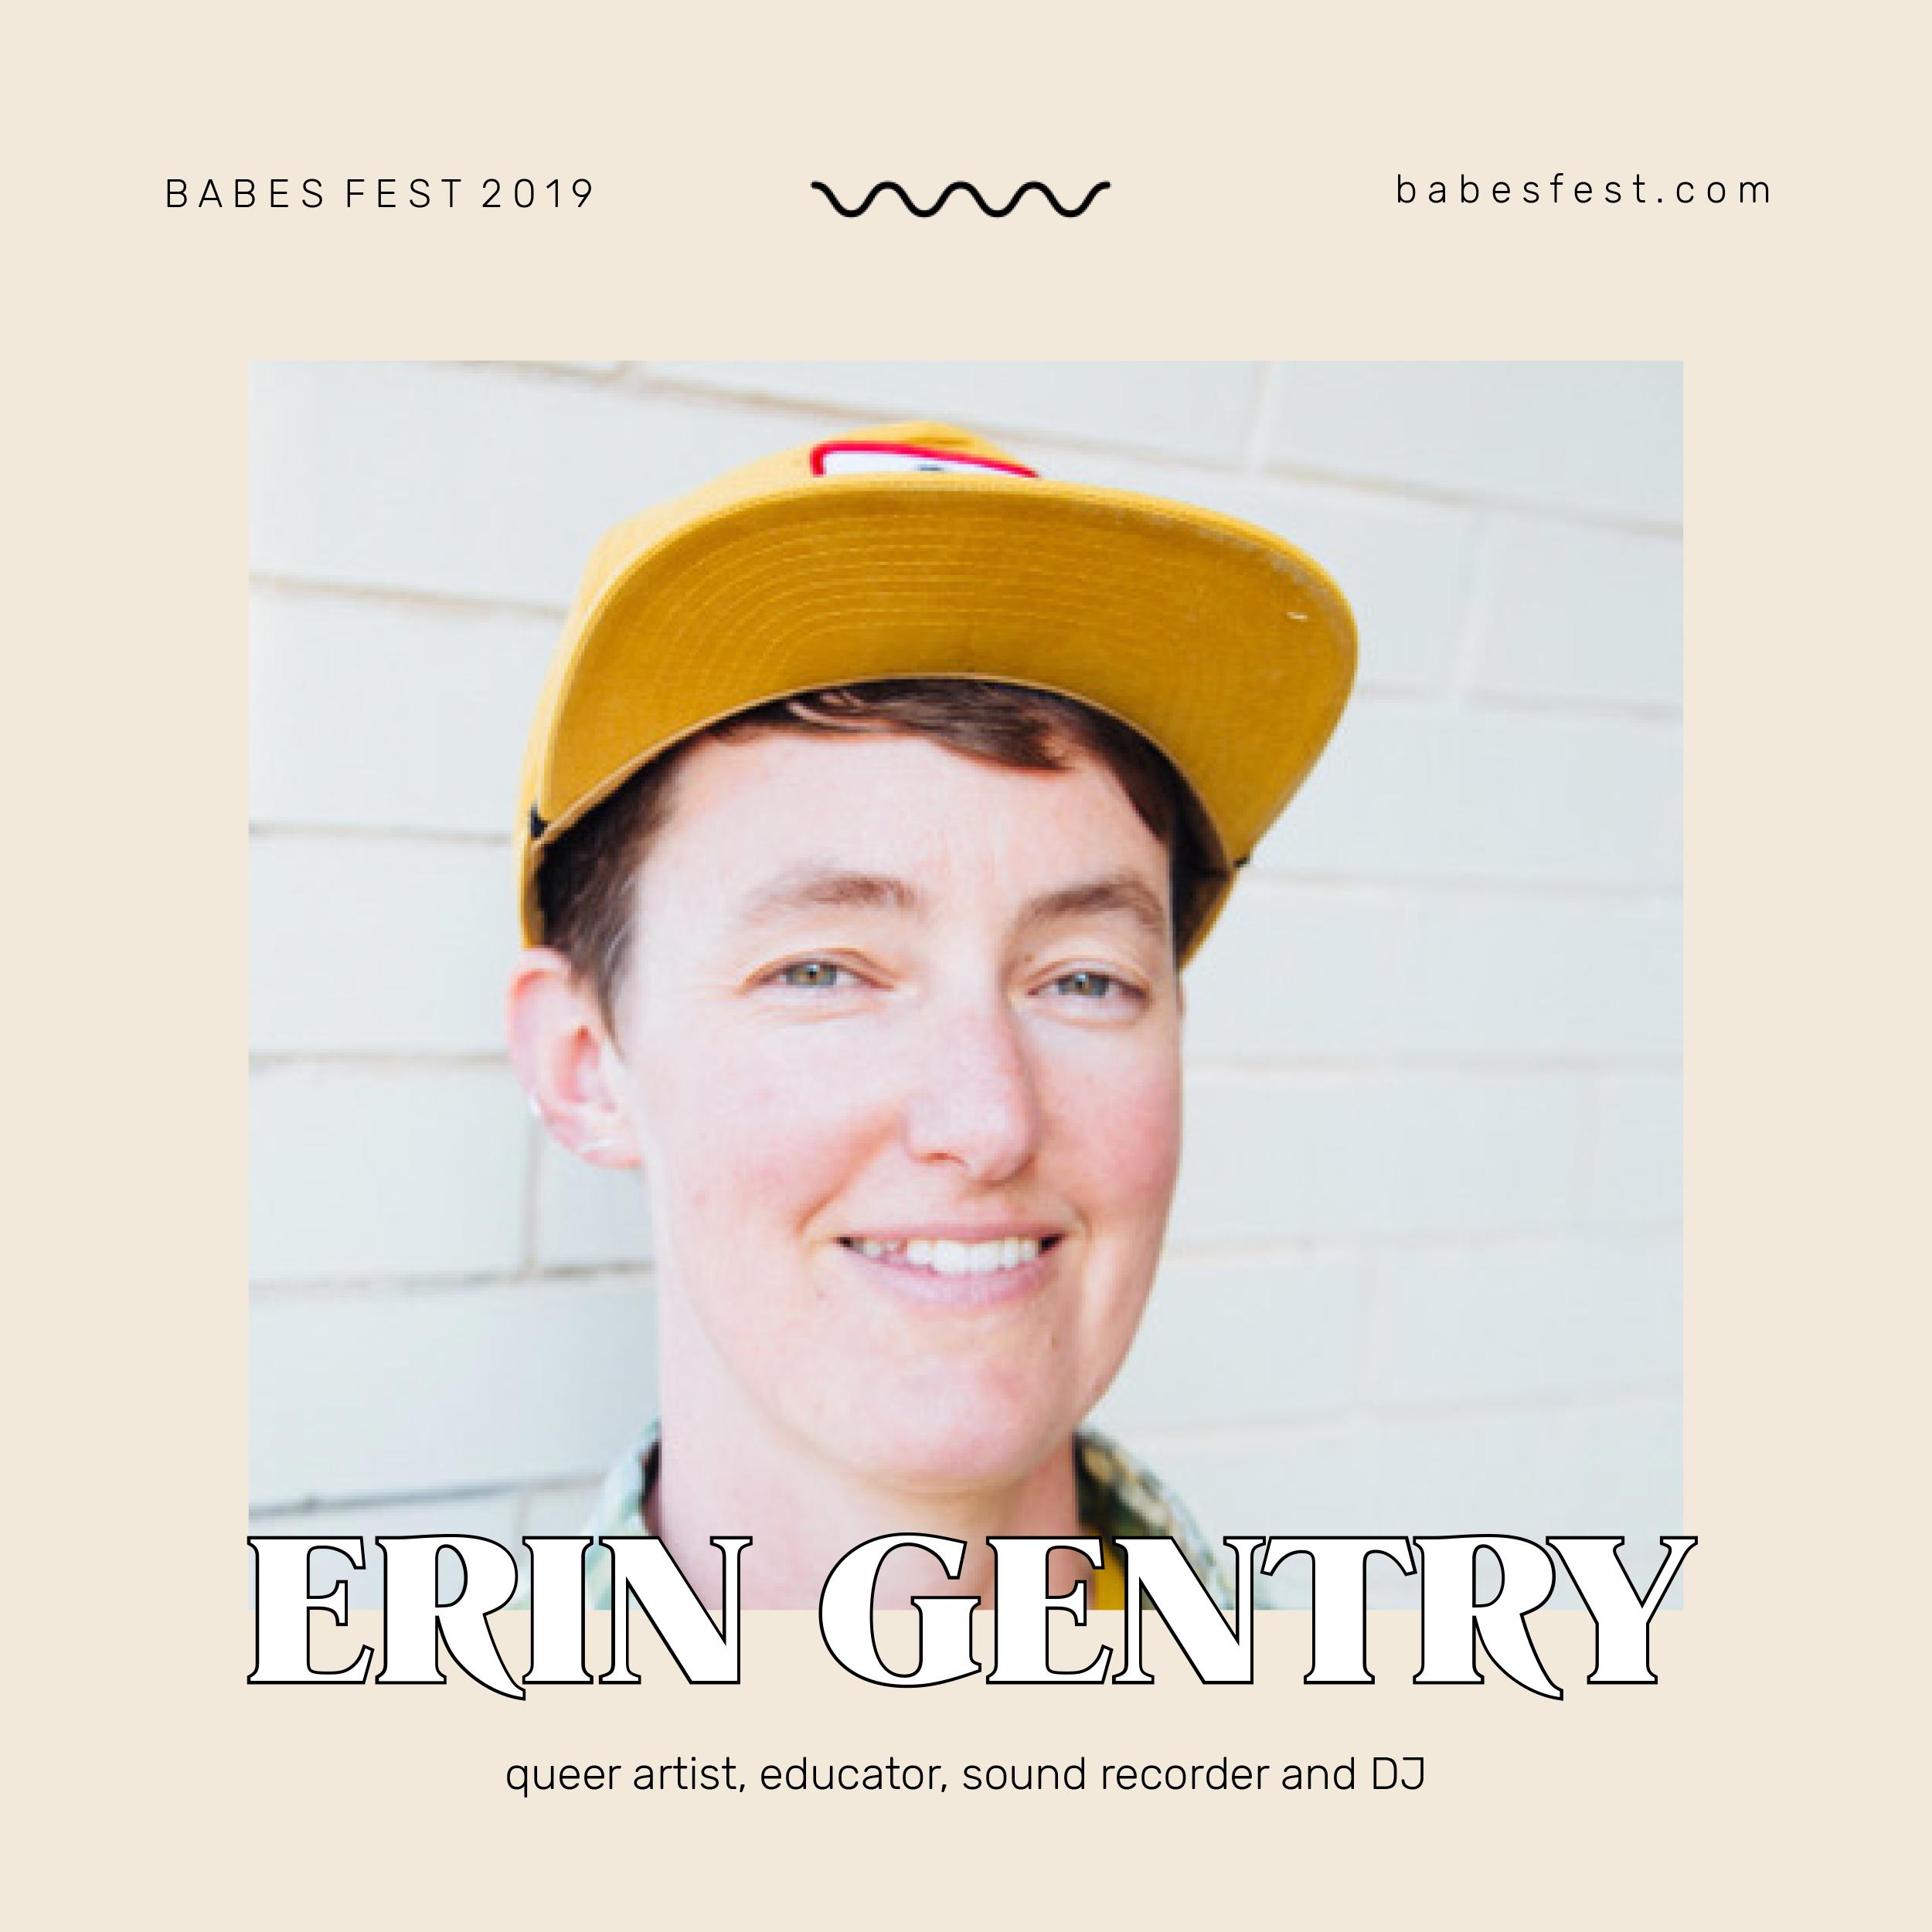 Erin Gentry